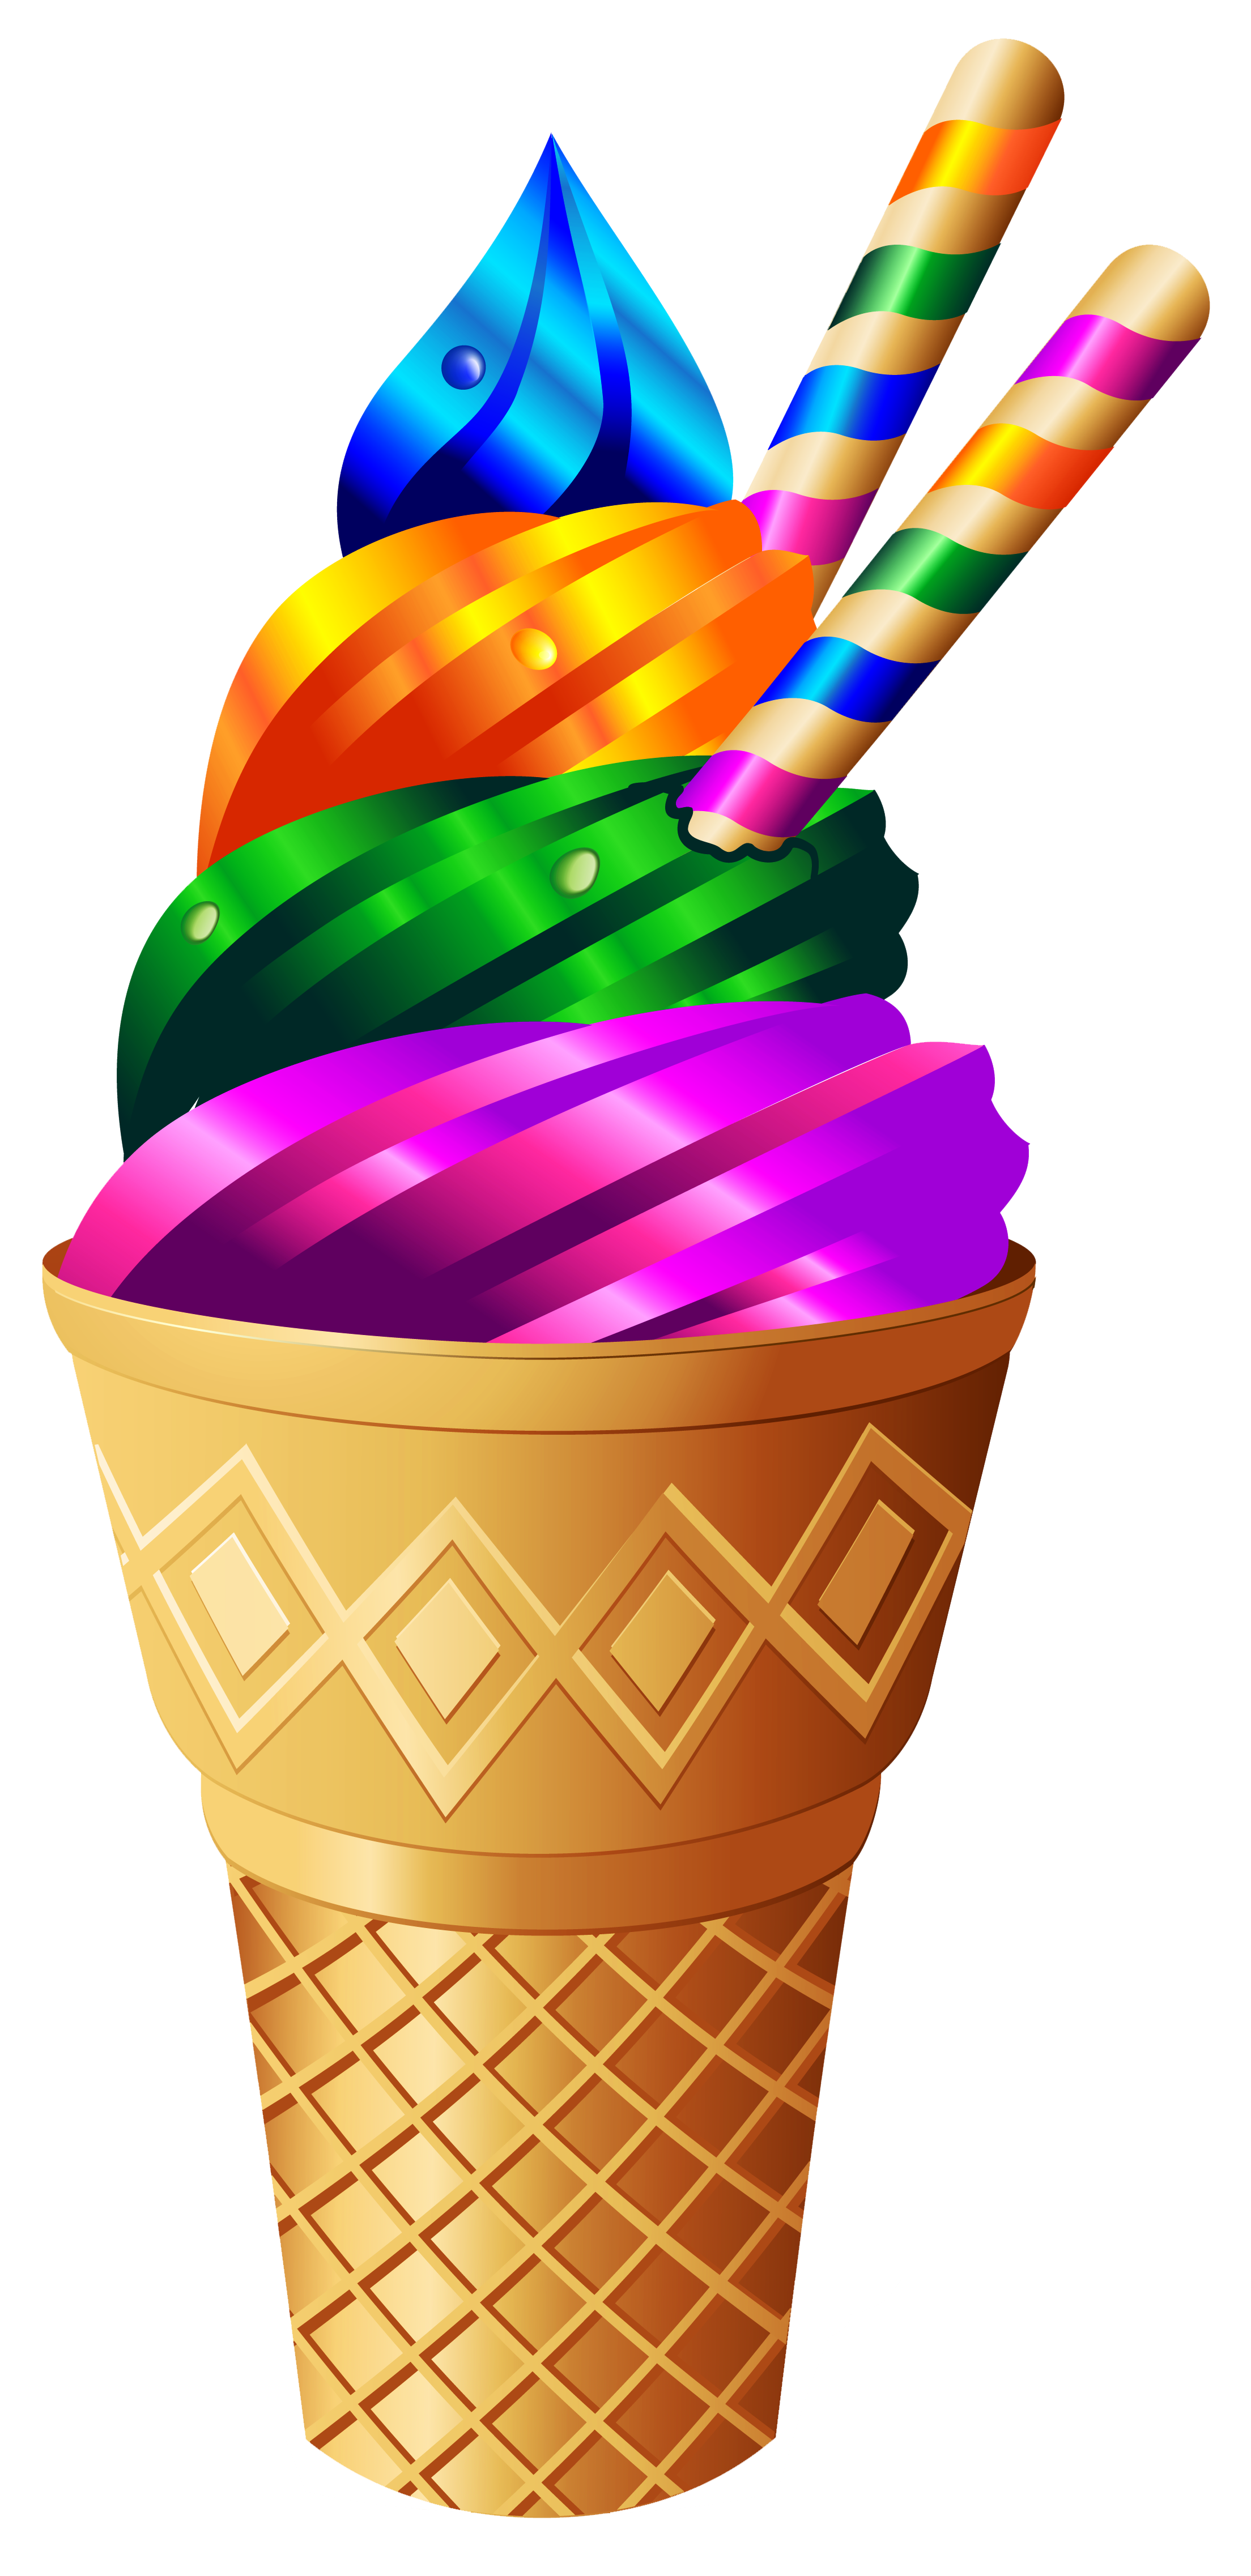 Cliparts essen und trinken clipart download Transparent Rainbow Ice Cream PNG Image | Scrap booking | Pinterest ... clipart download